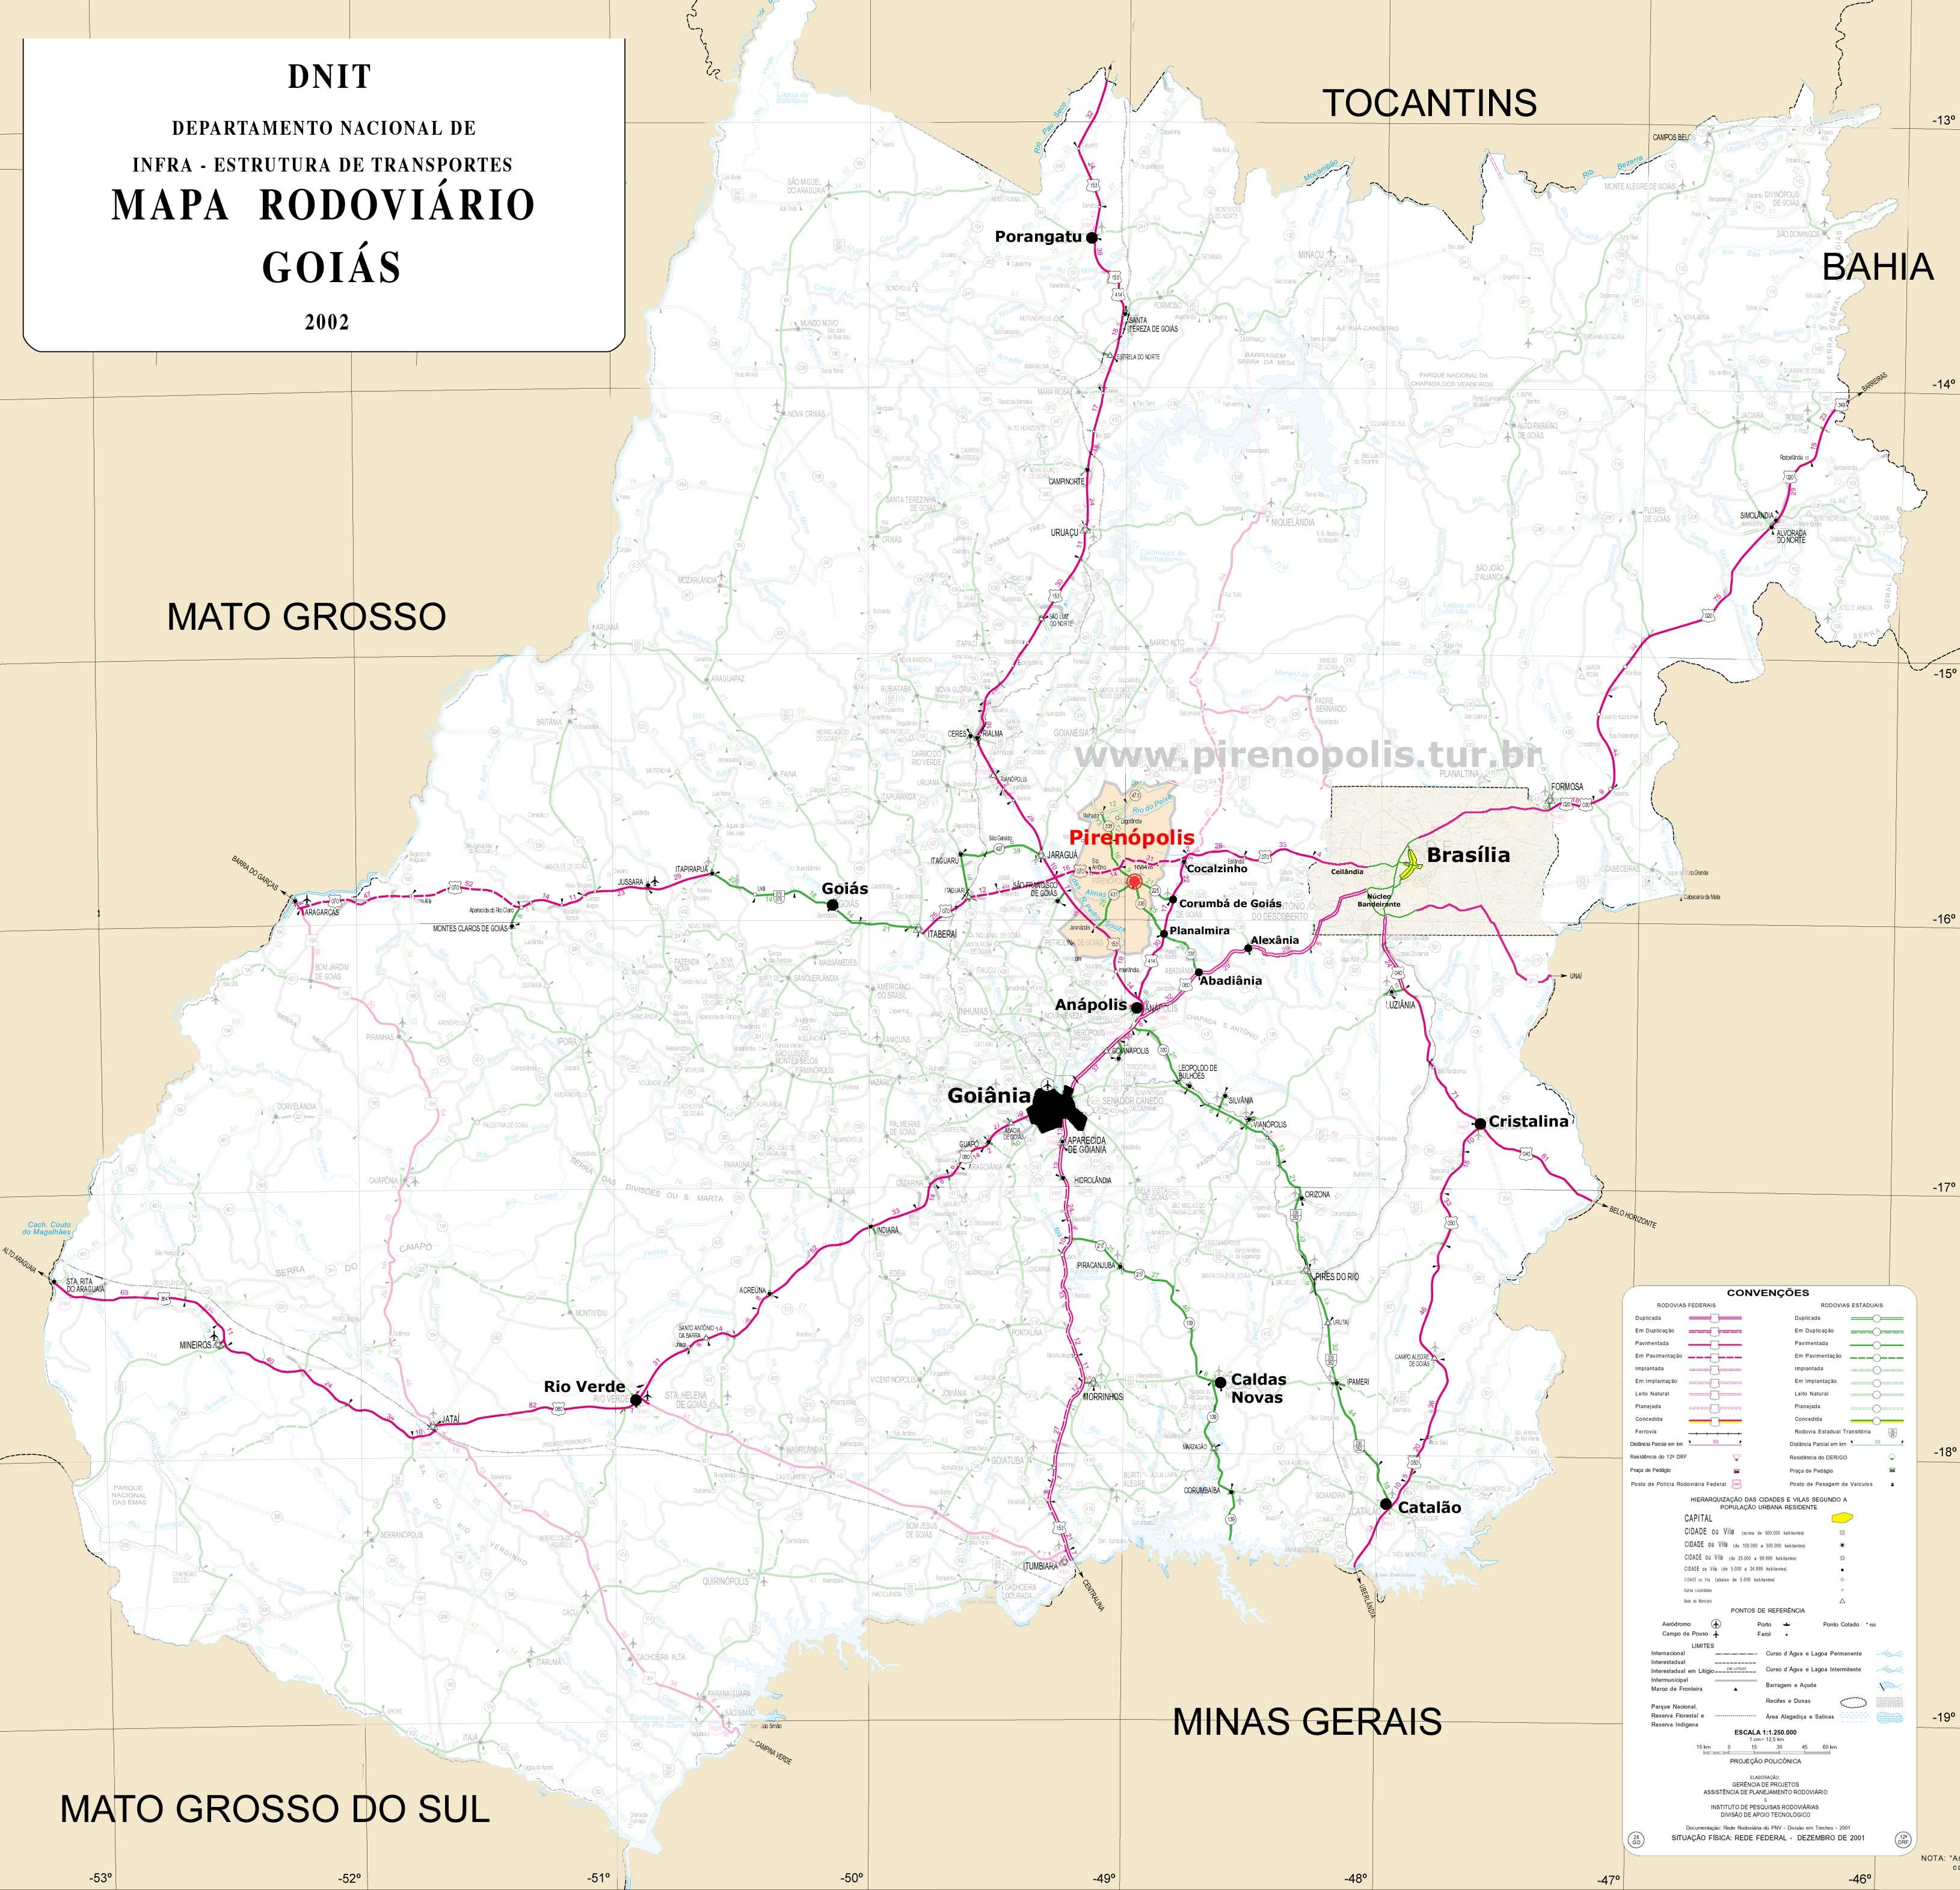 Mapas e Grficos  Pirenpolis  Gois  Brasil